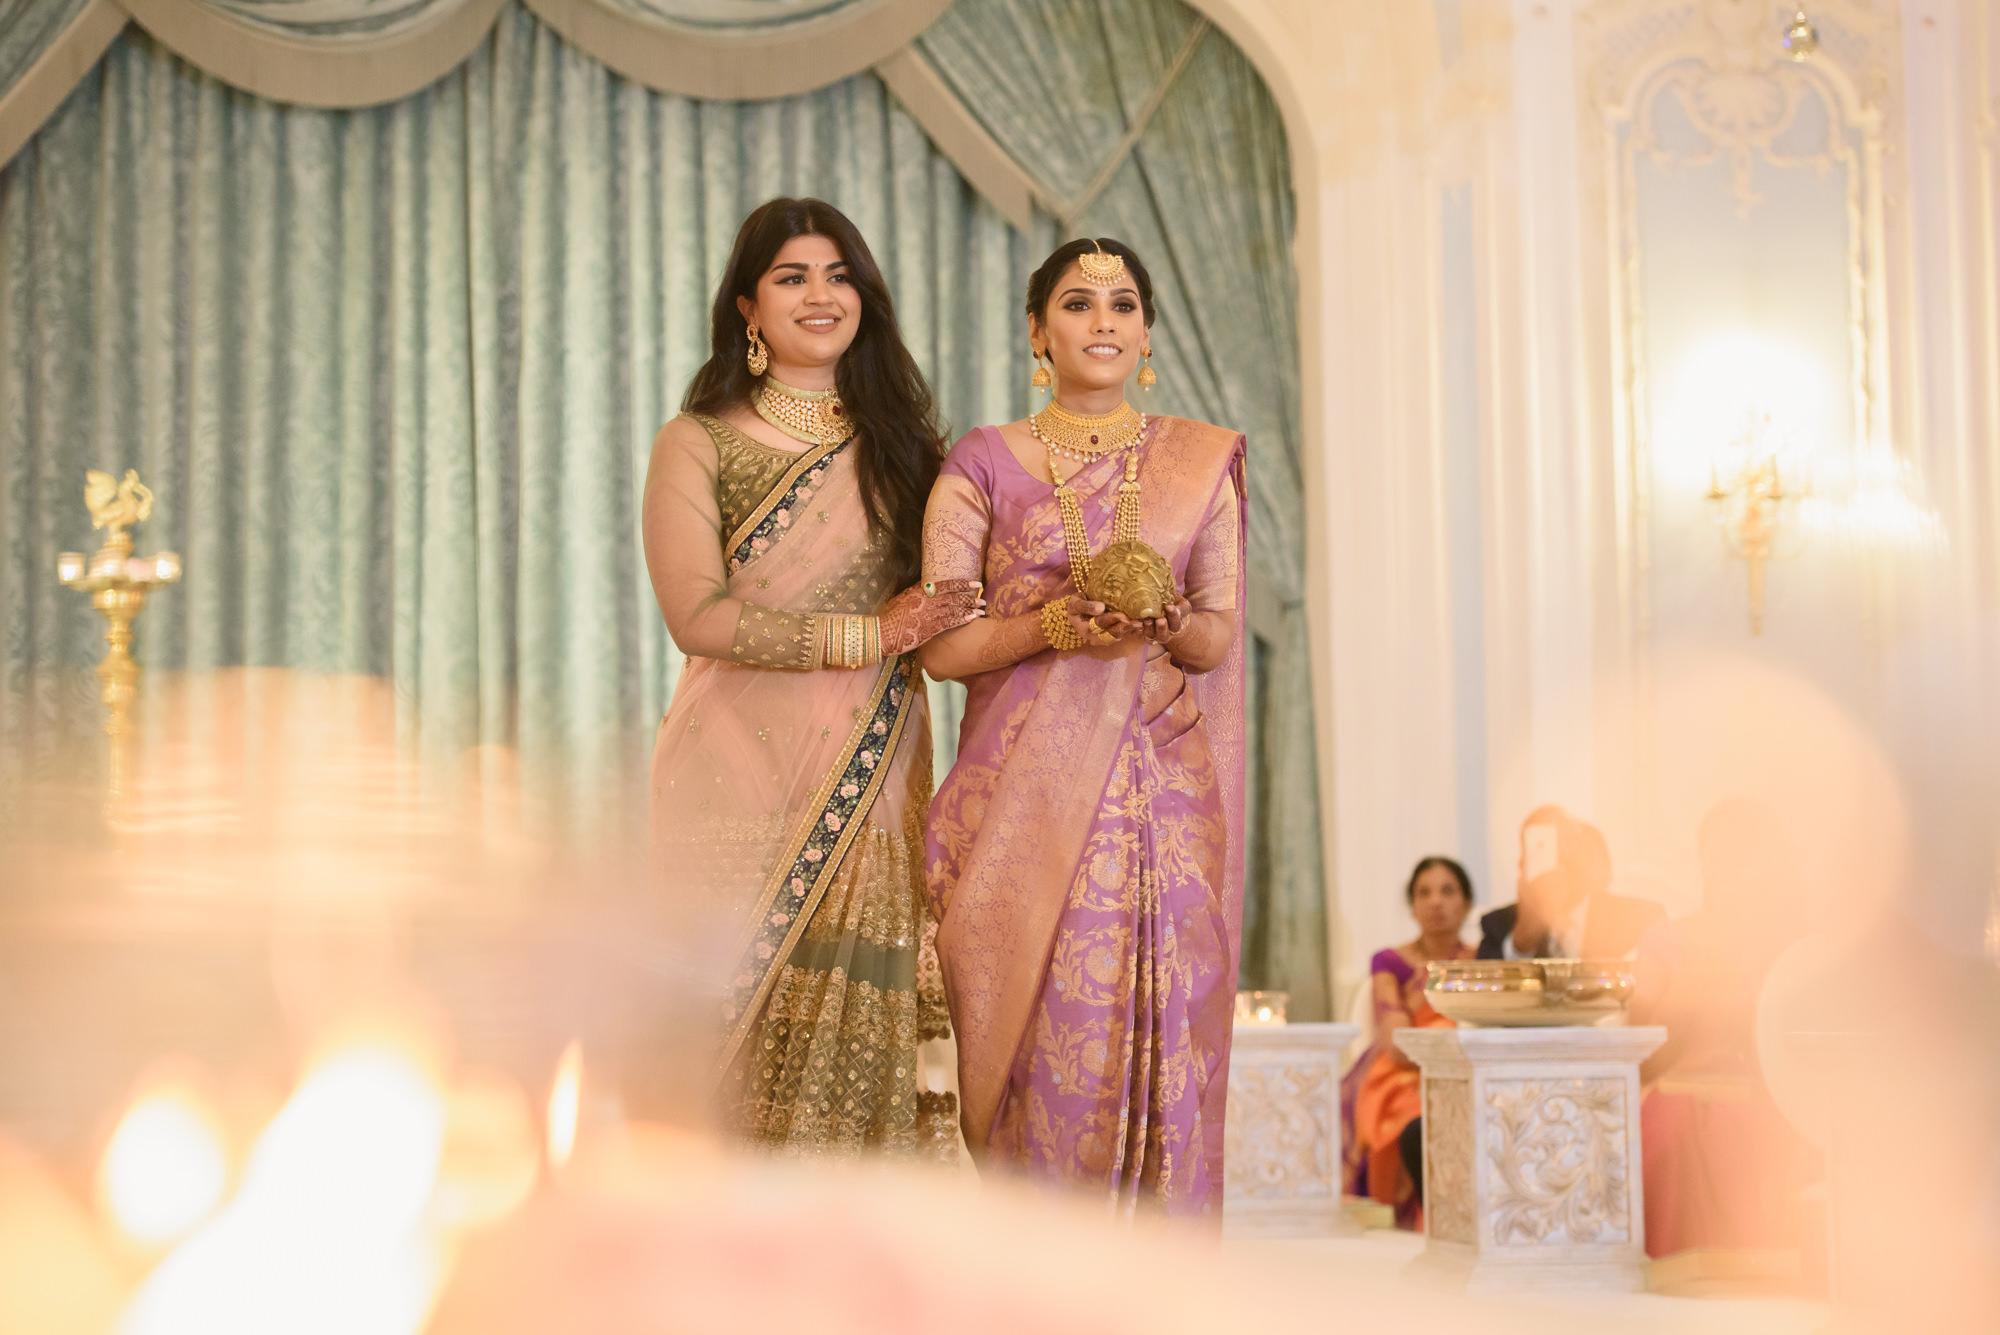 Tamil Gujrati hindu wedding photography photographer london the savoy -38.jpg